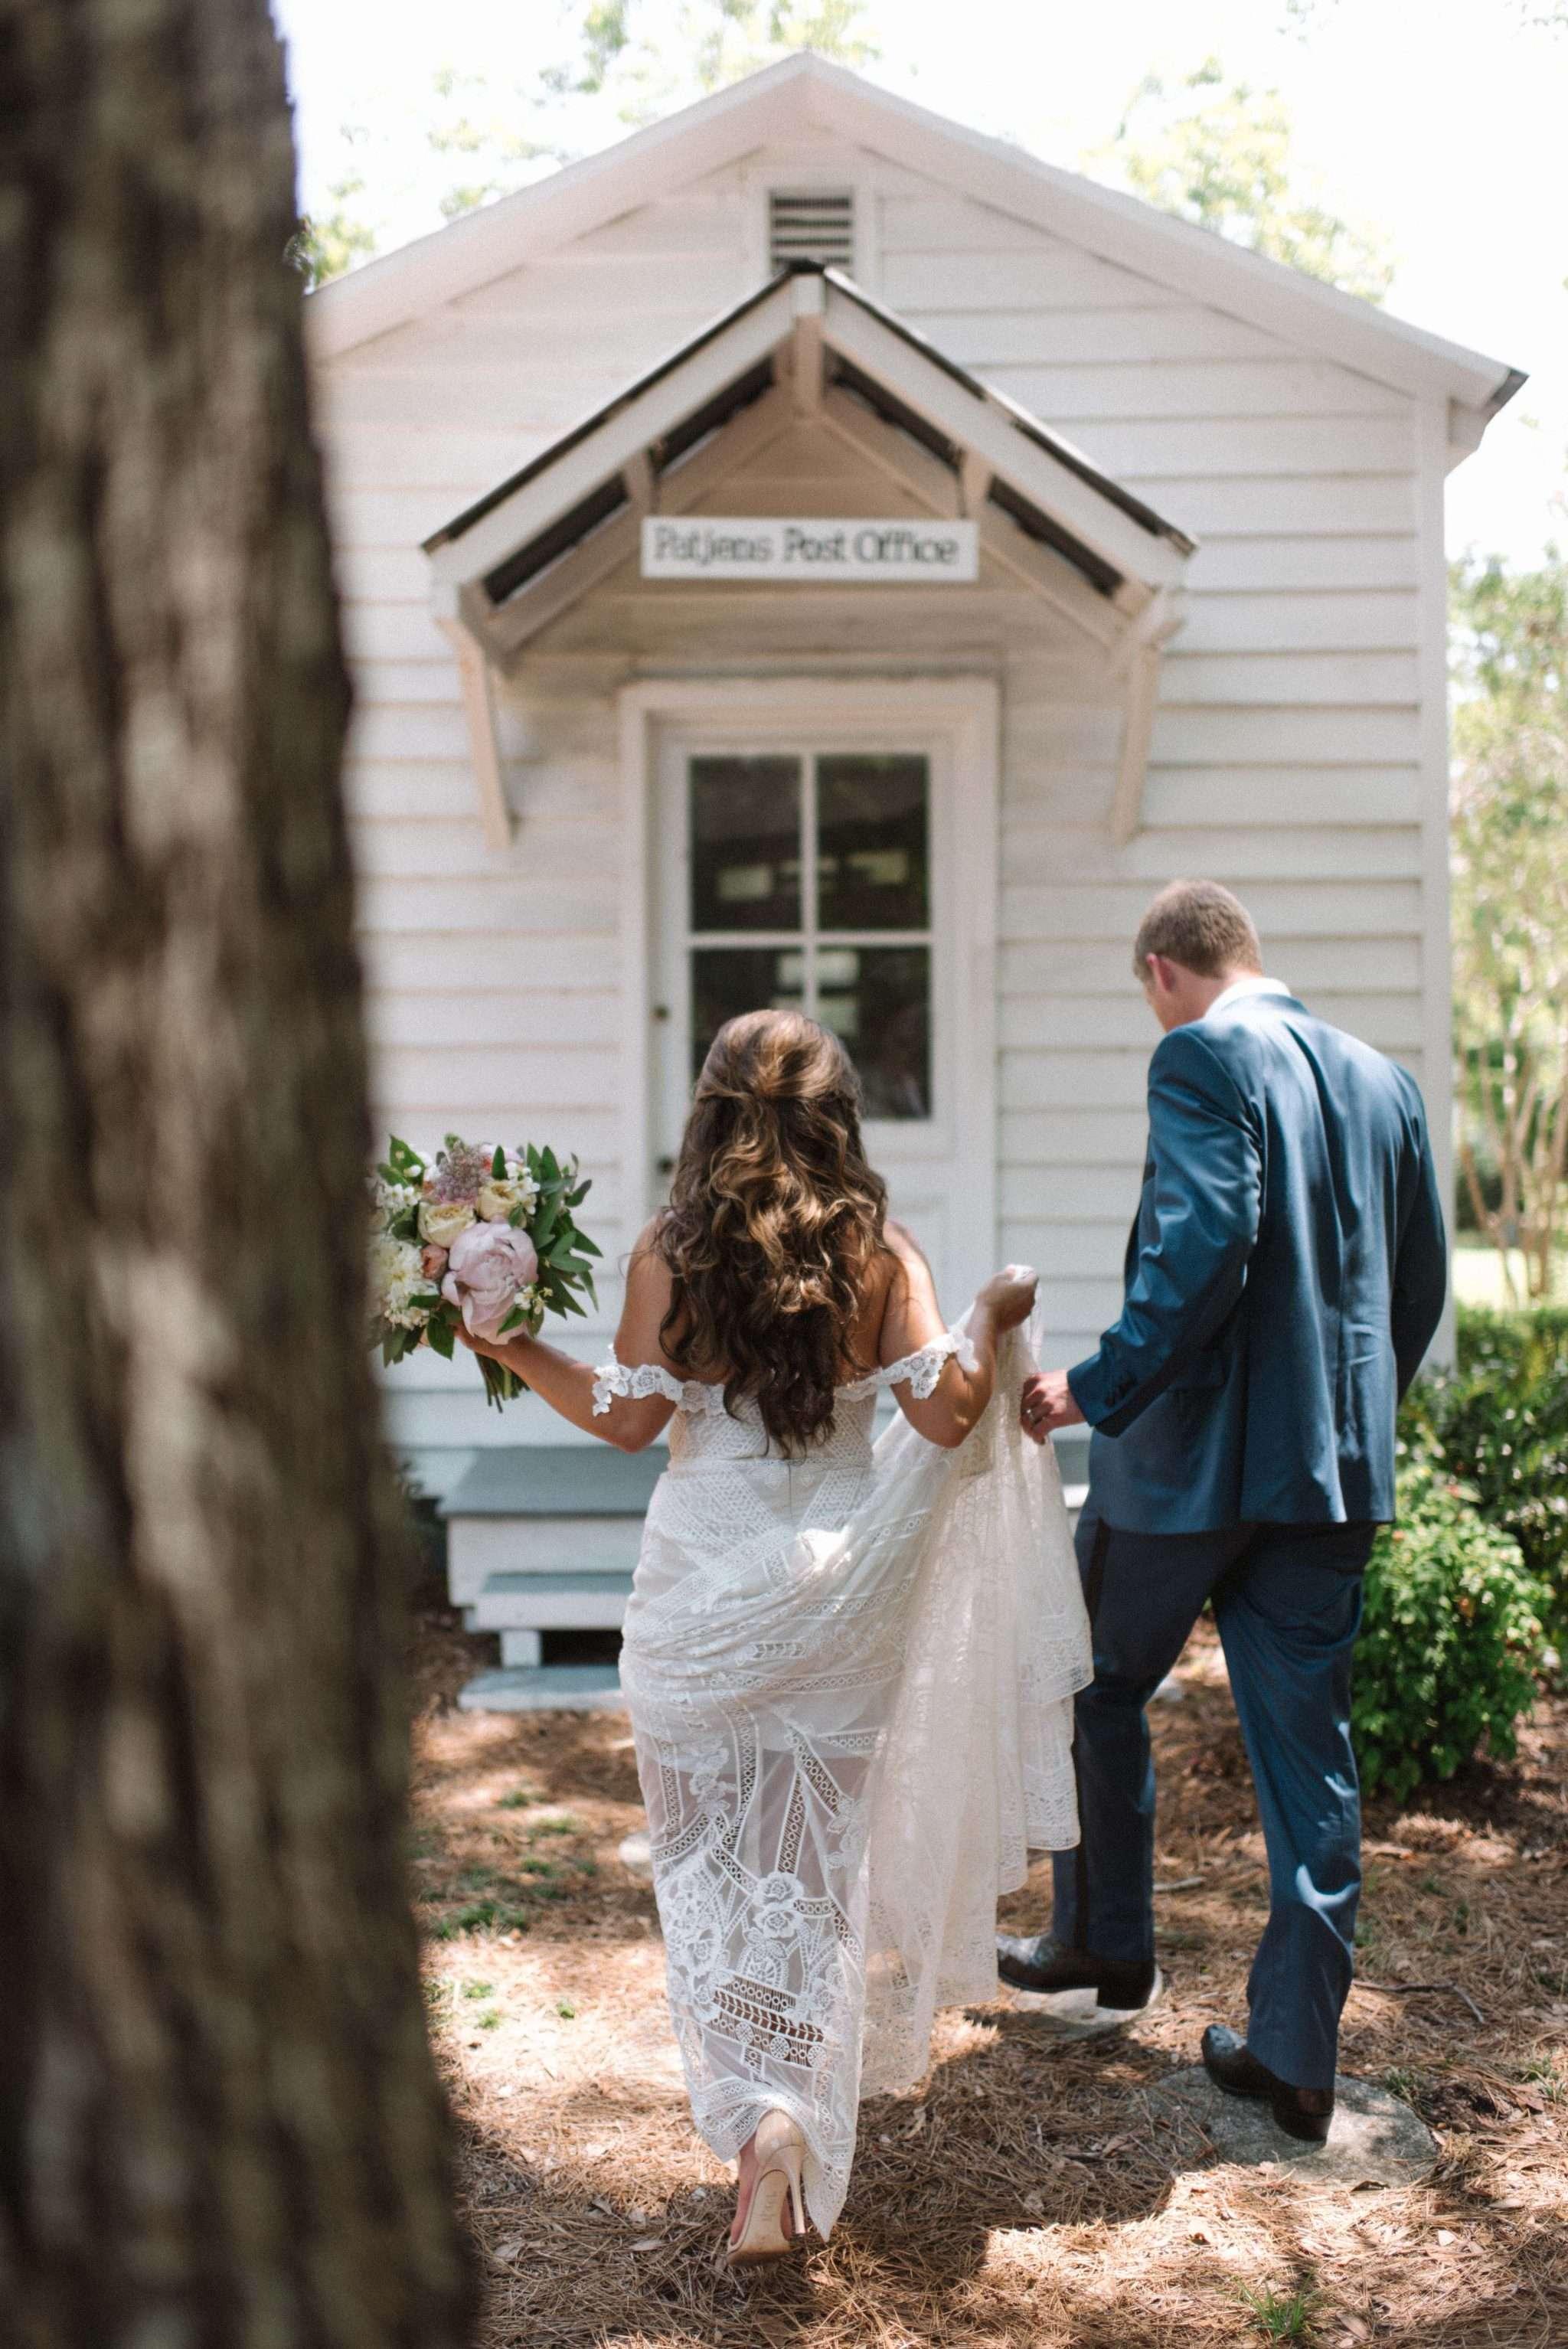 Ultimate Wedding Planning Checklist + Helpful Wedding Planning Tips   Rhyme & Reason